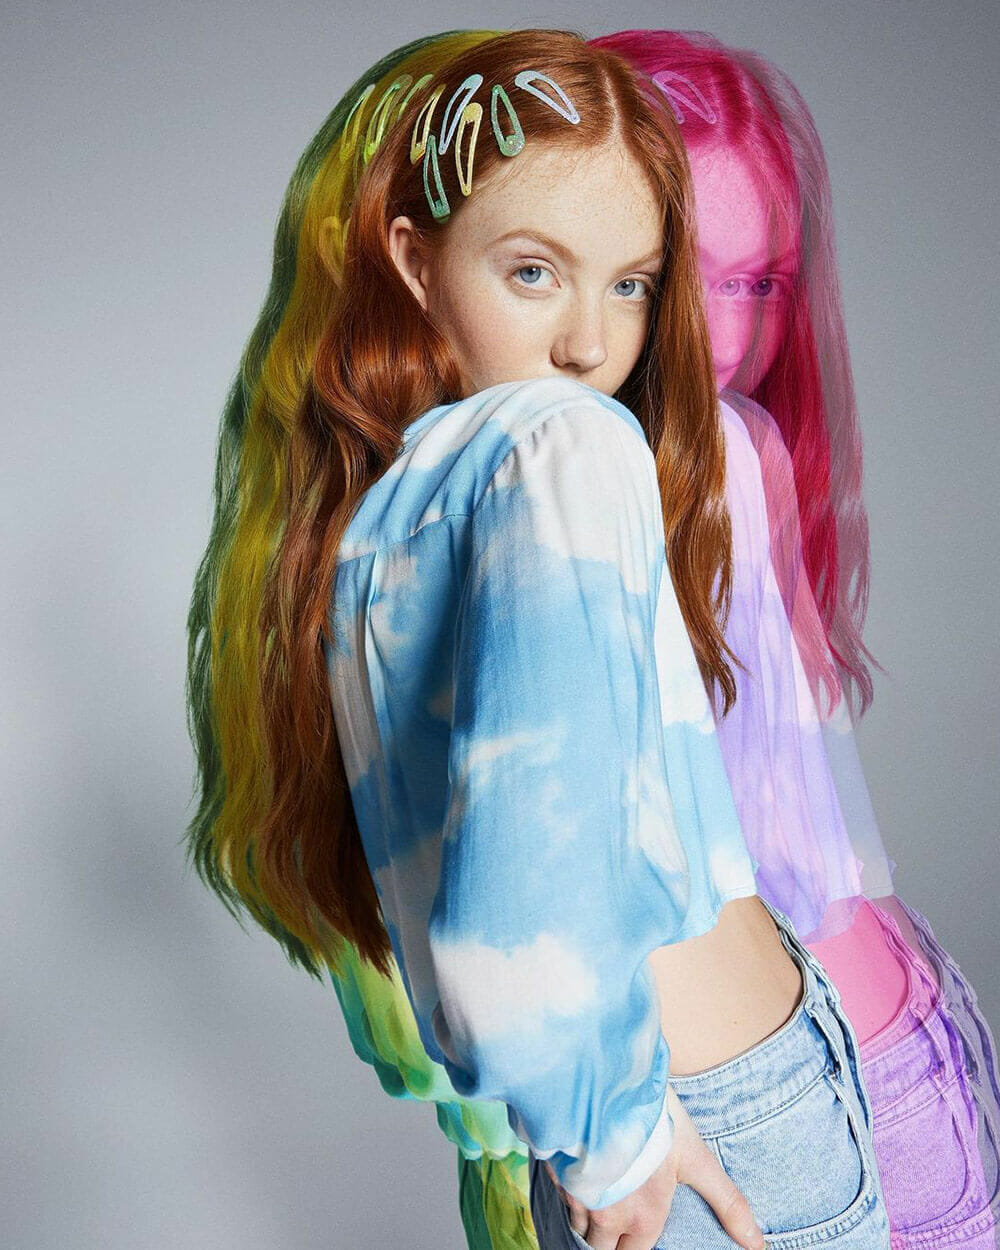 BERSHKA E-girl clothing